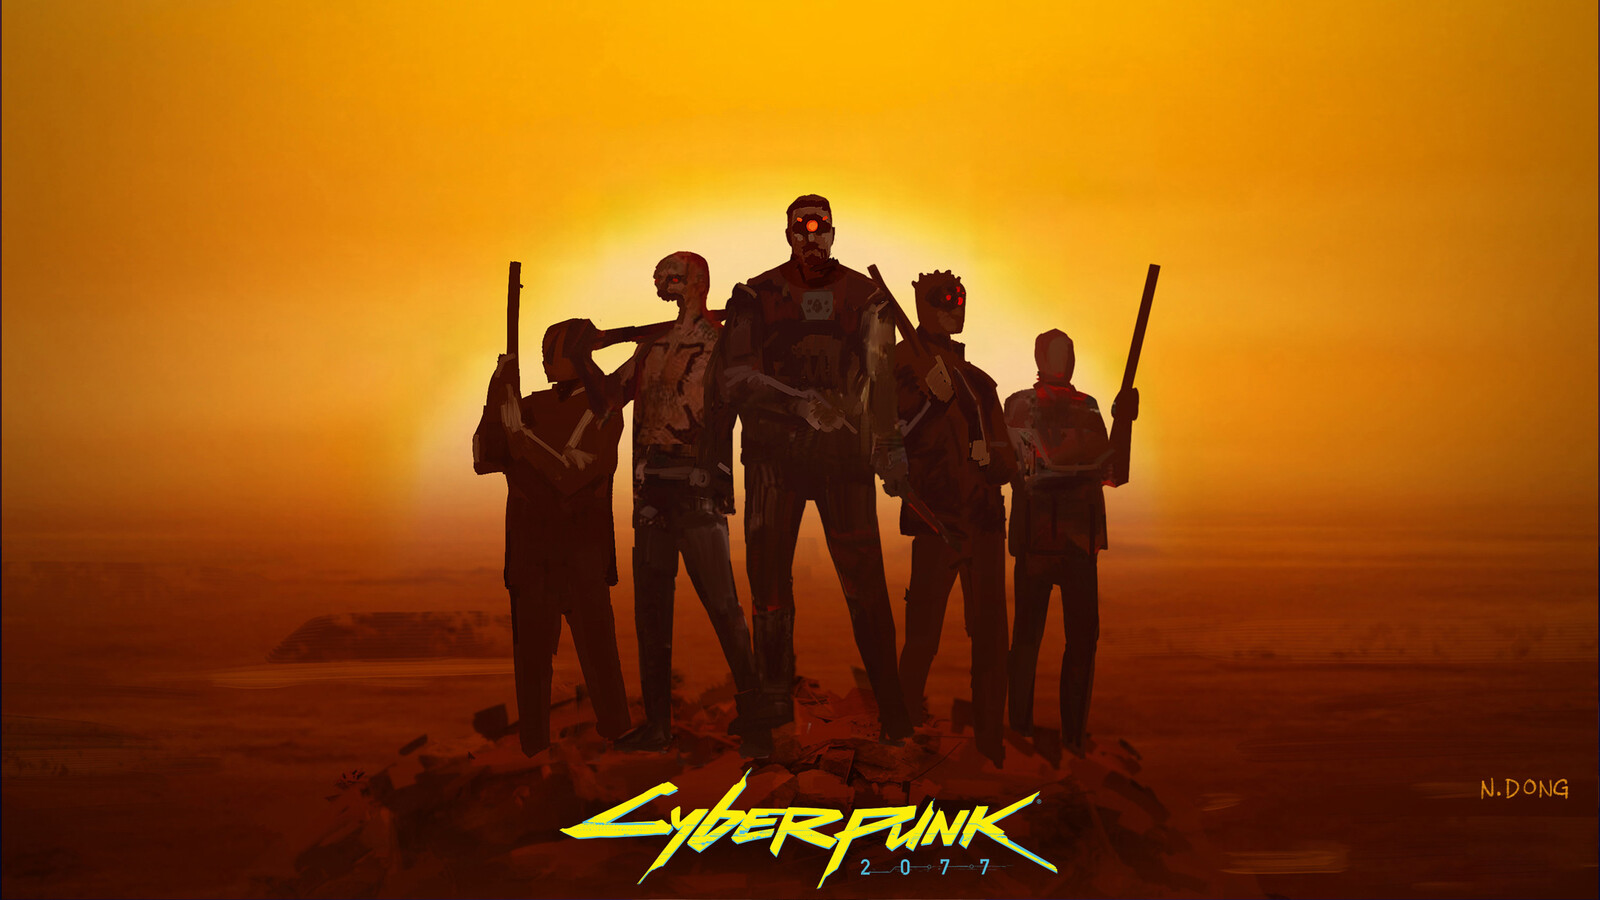 Cyberpunk 2077 - Maelstrom Gang